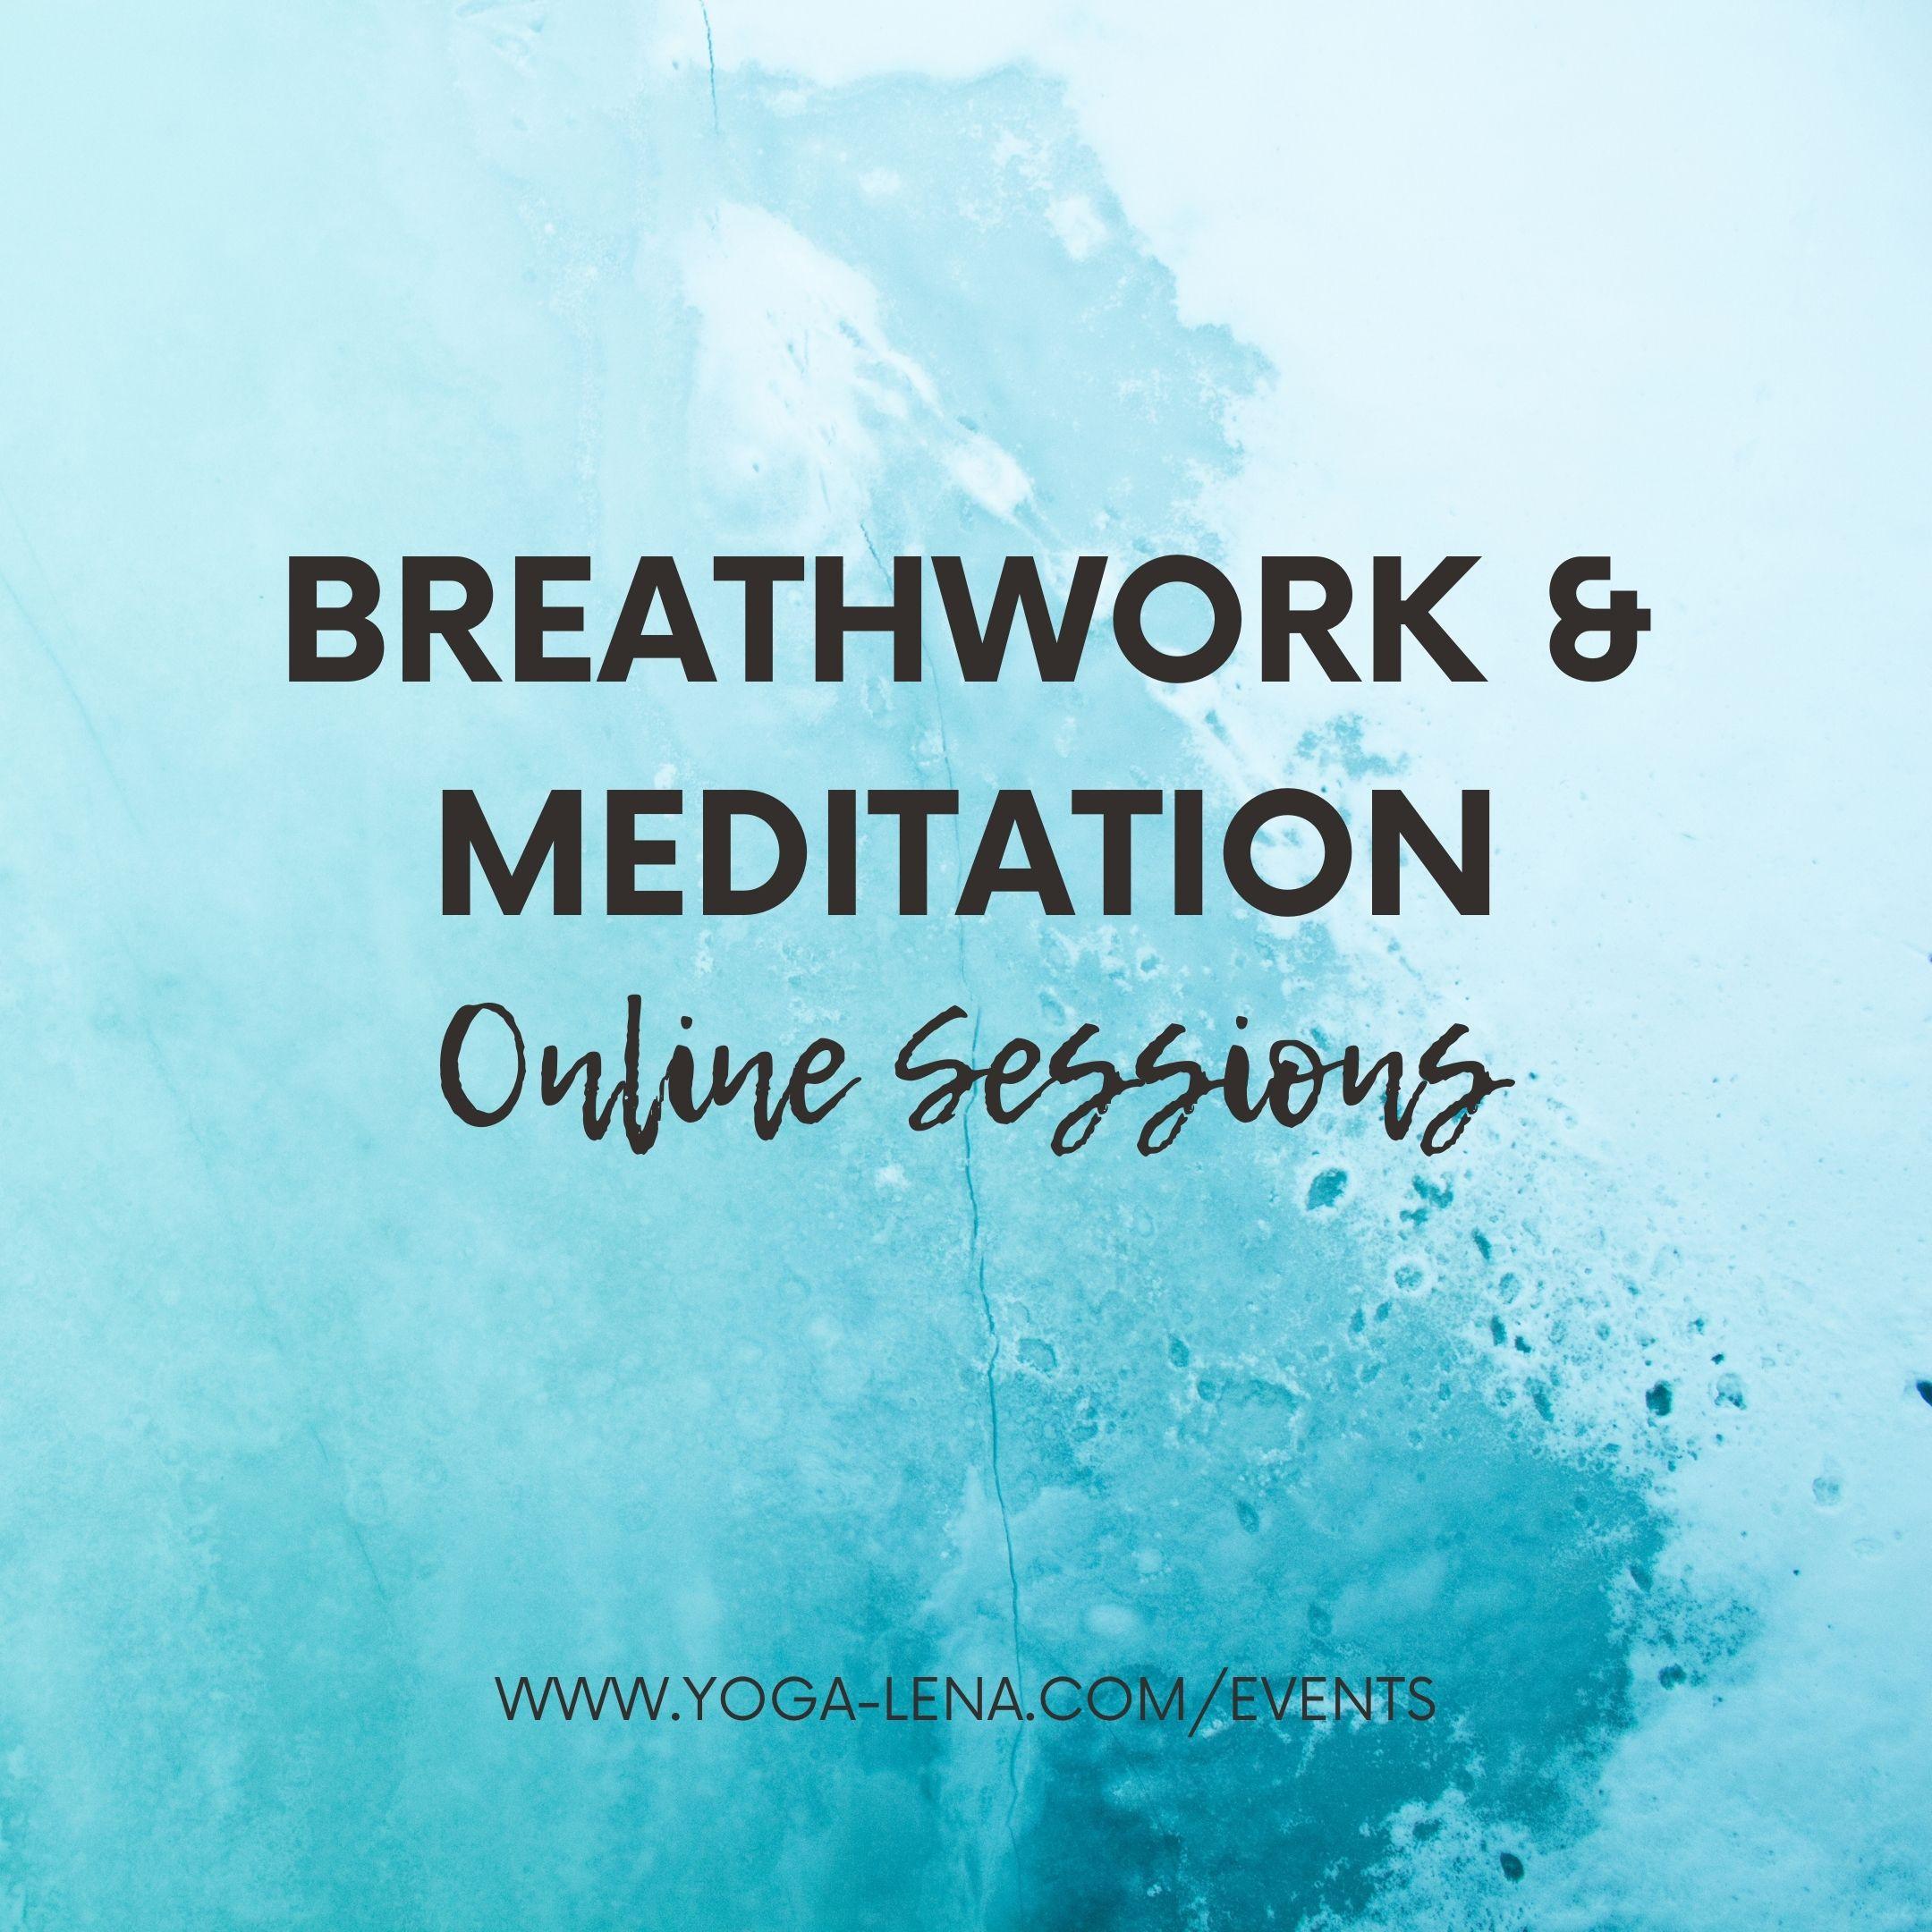 Breathwork & Meditation Online Sessions